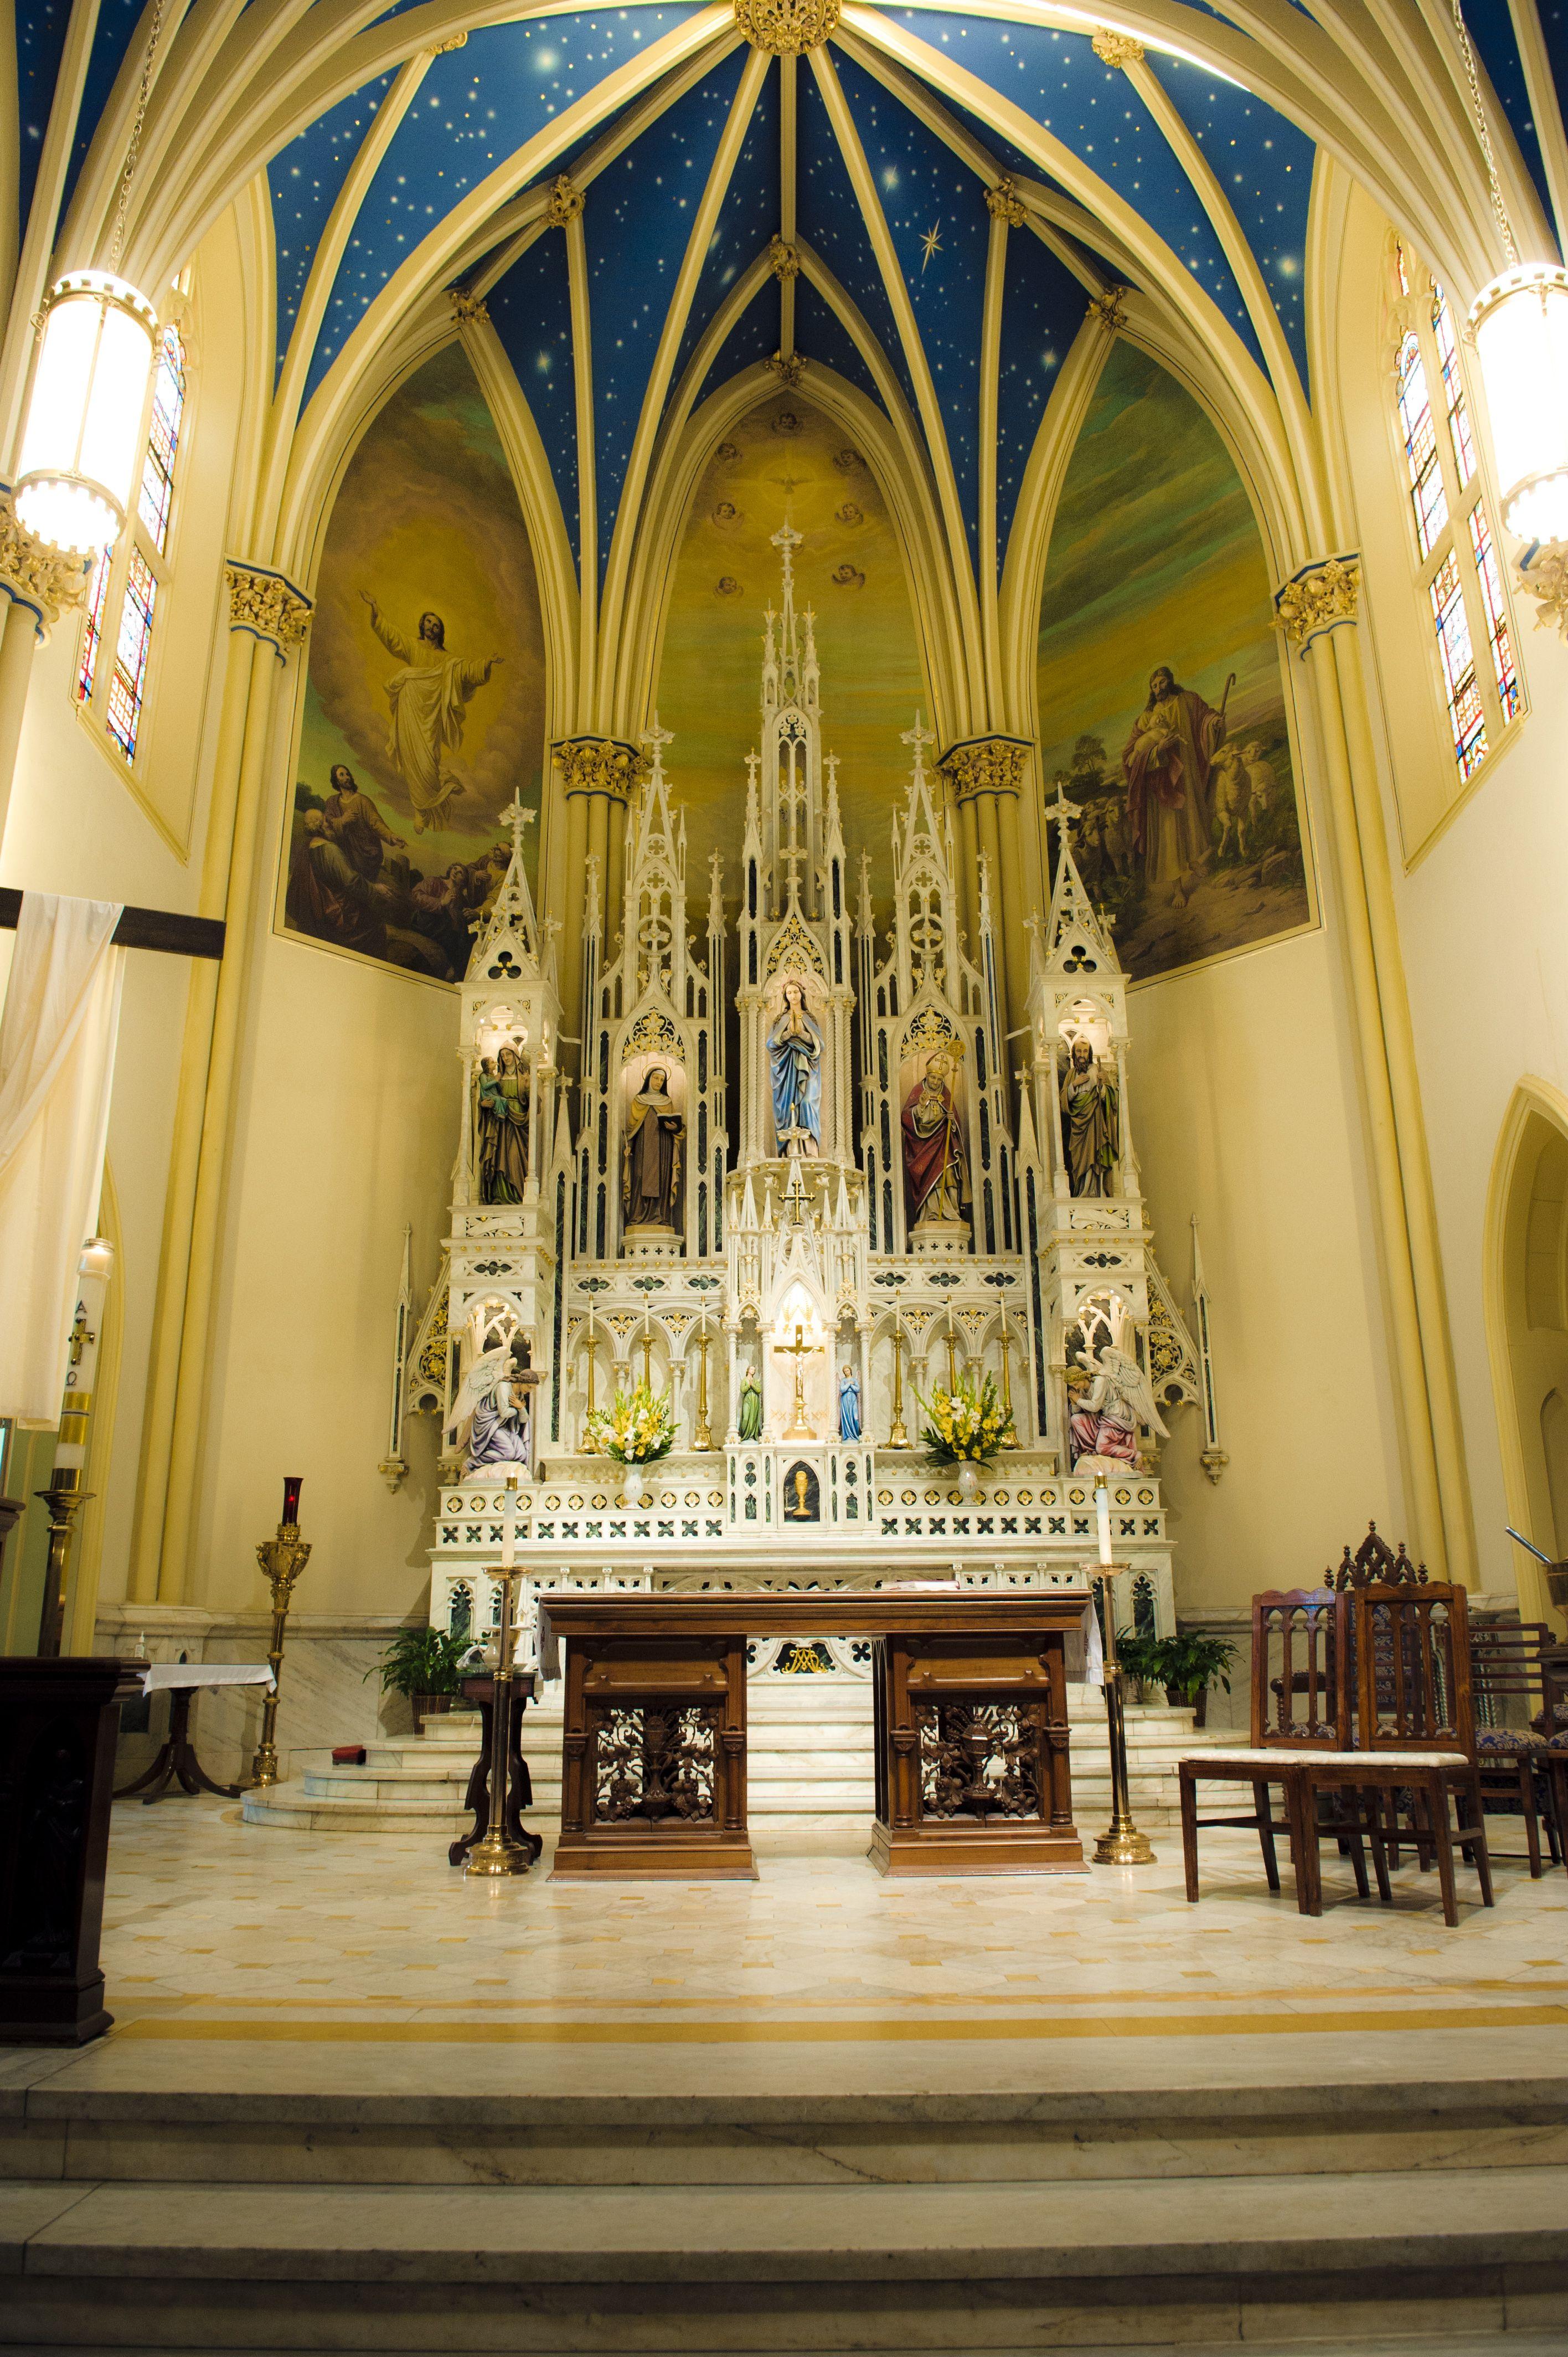 St marys catholic church in annapolis maryland great wedding st marys catholic church in annapolis maryland great wedding site biocorpaavc